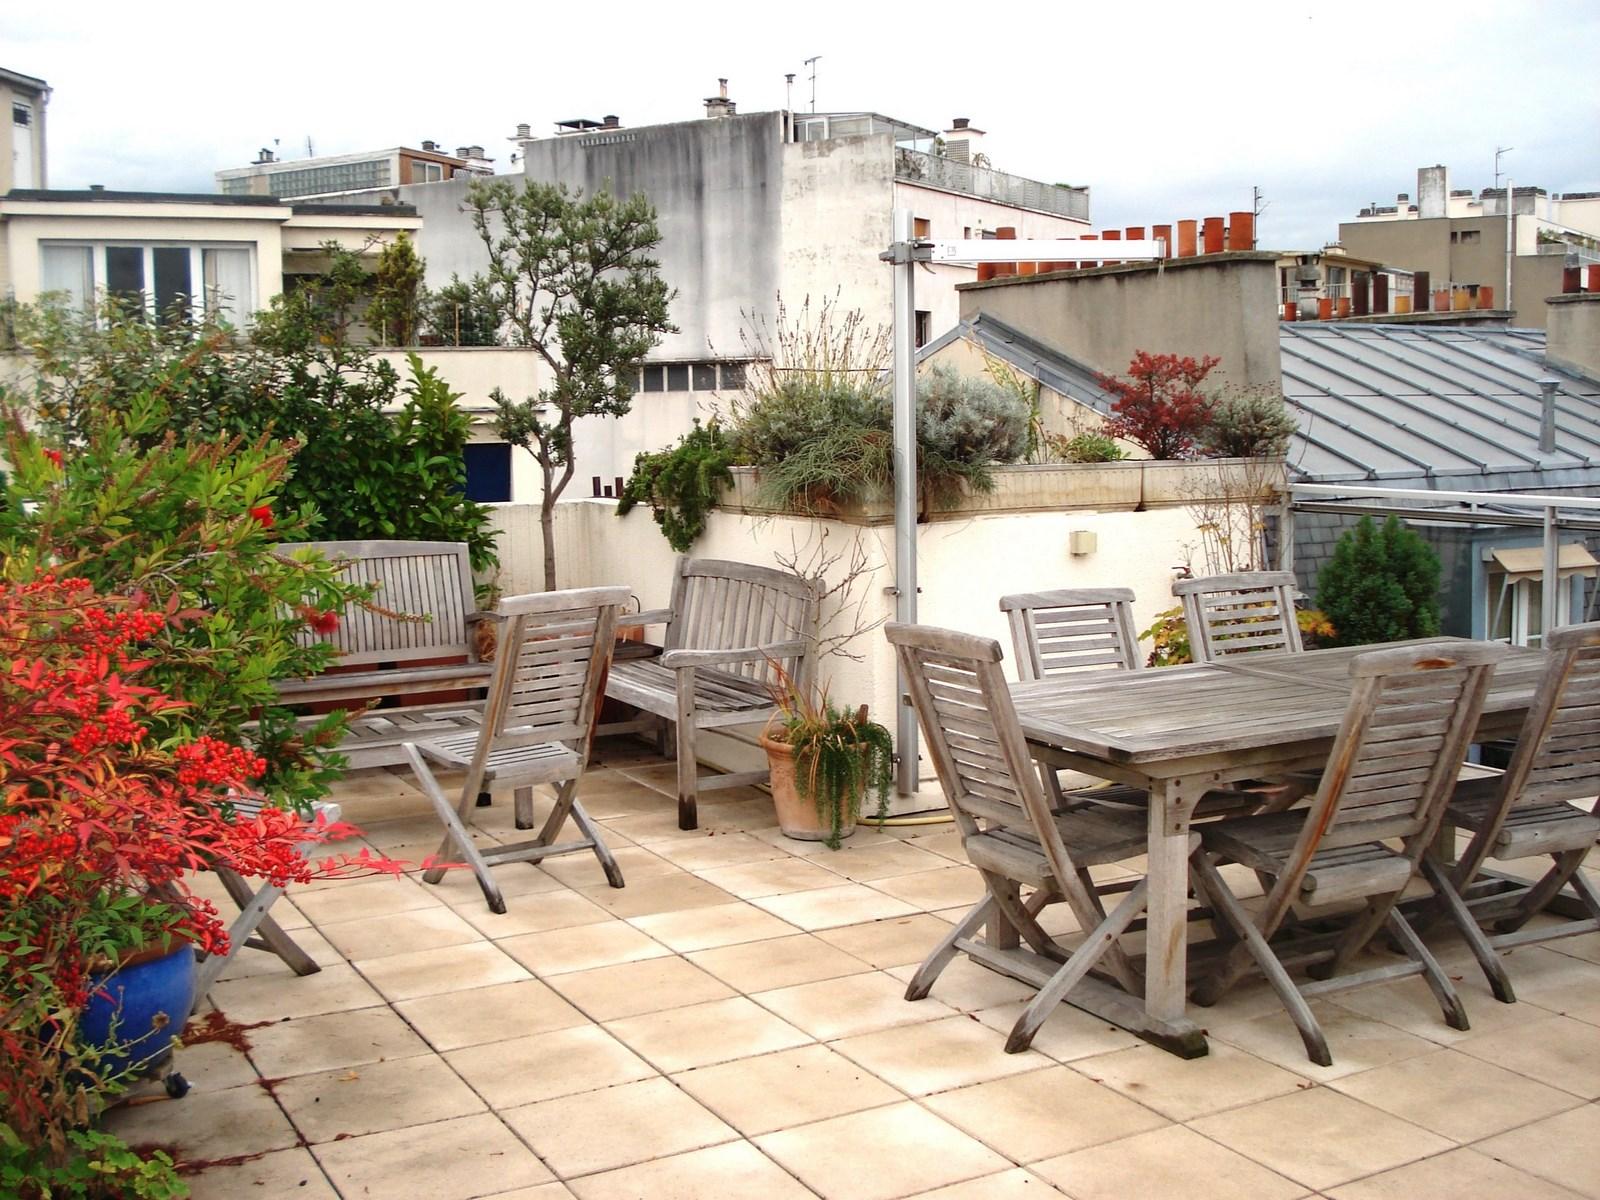 appartement avec terrasse ou balcon - veranda-styledevie.fr